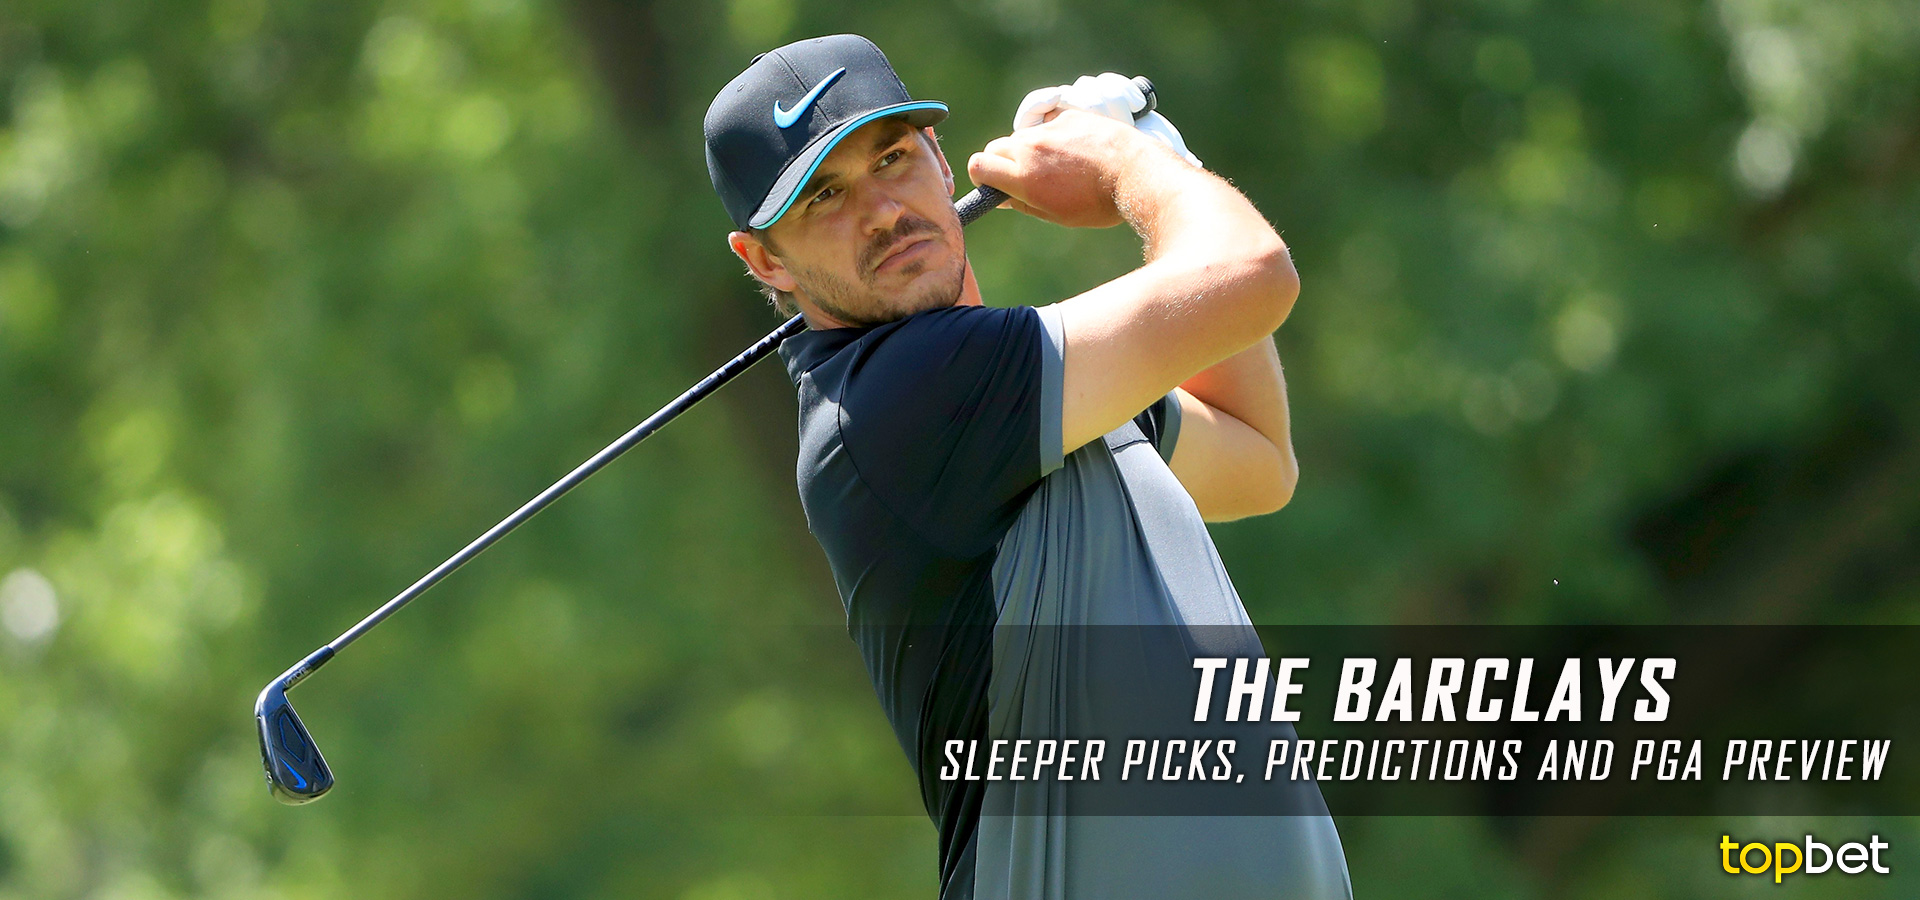 pga golf odds vegas nfl tipping